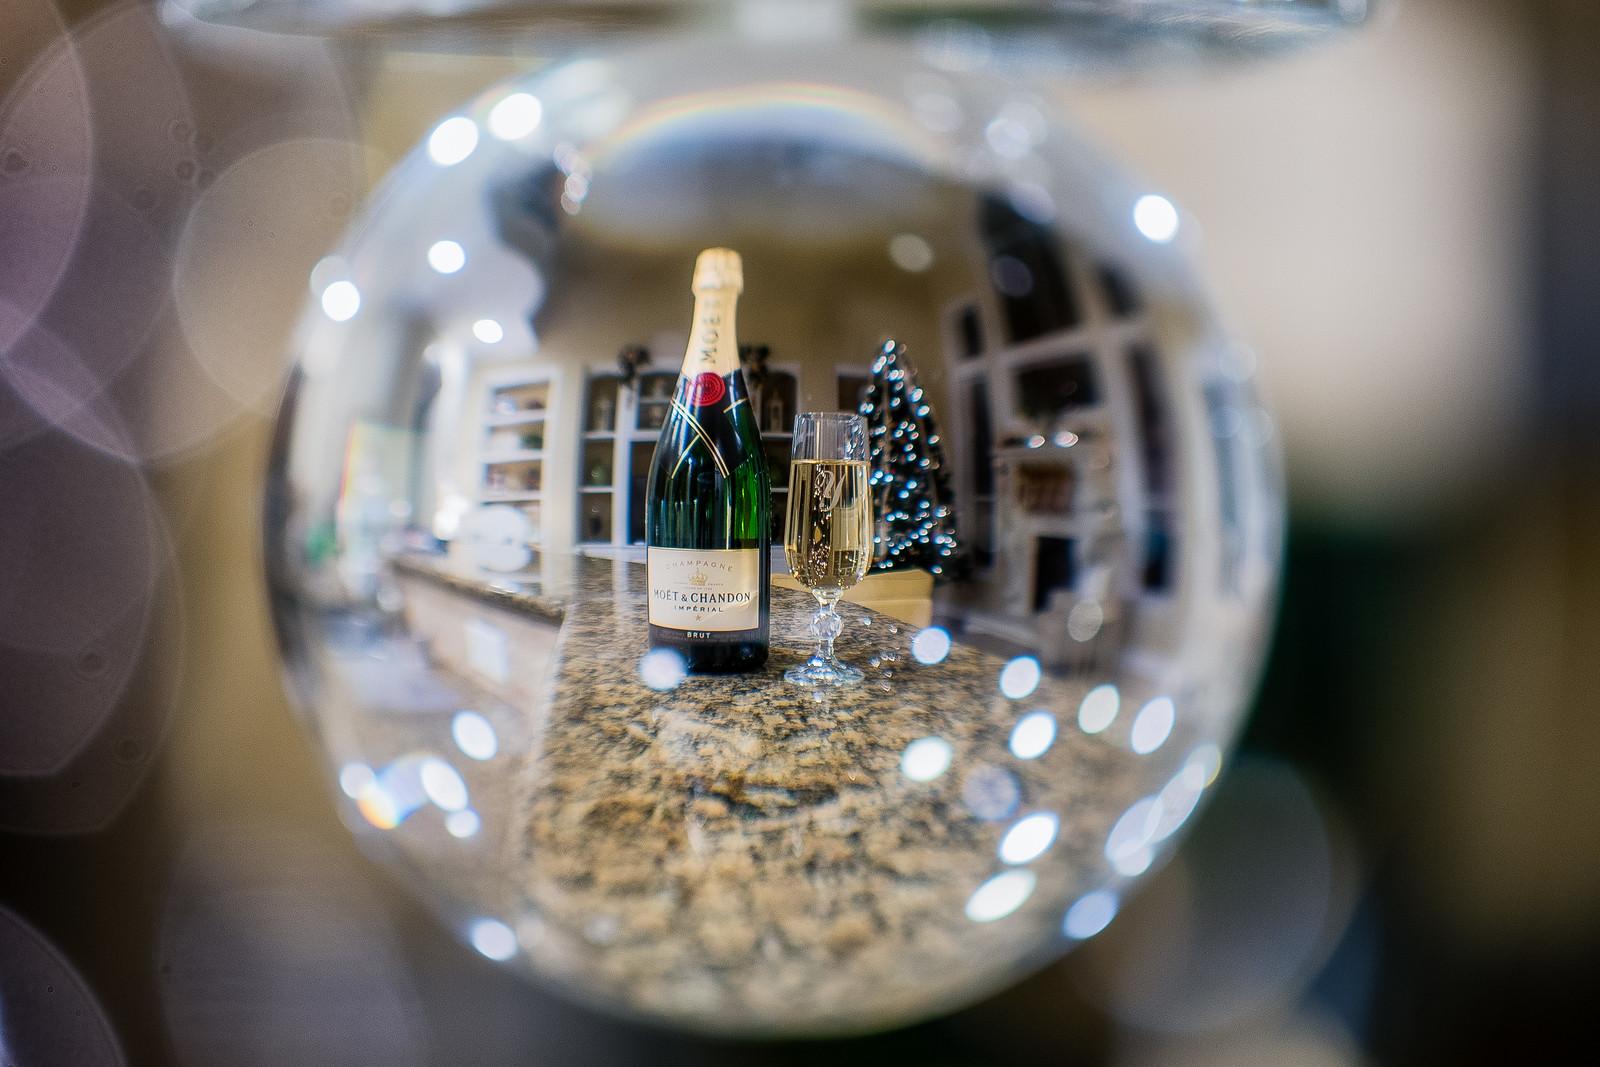 1:52 Happy New Year!, Nikon D750, AF-S DX Micro Nikkor 85mm f/3.5G ED VR